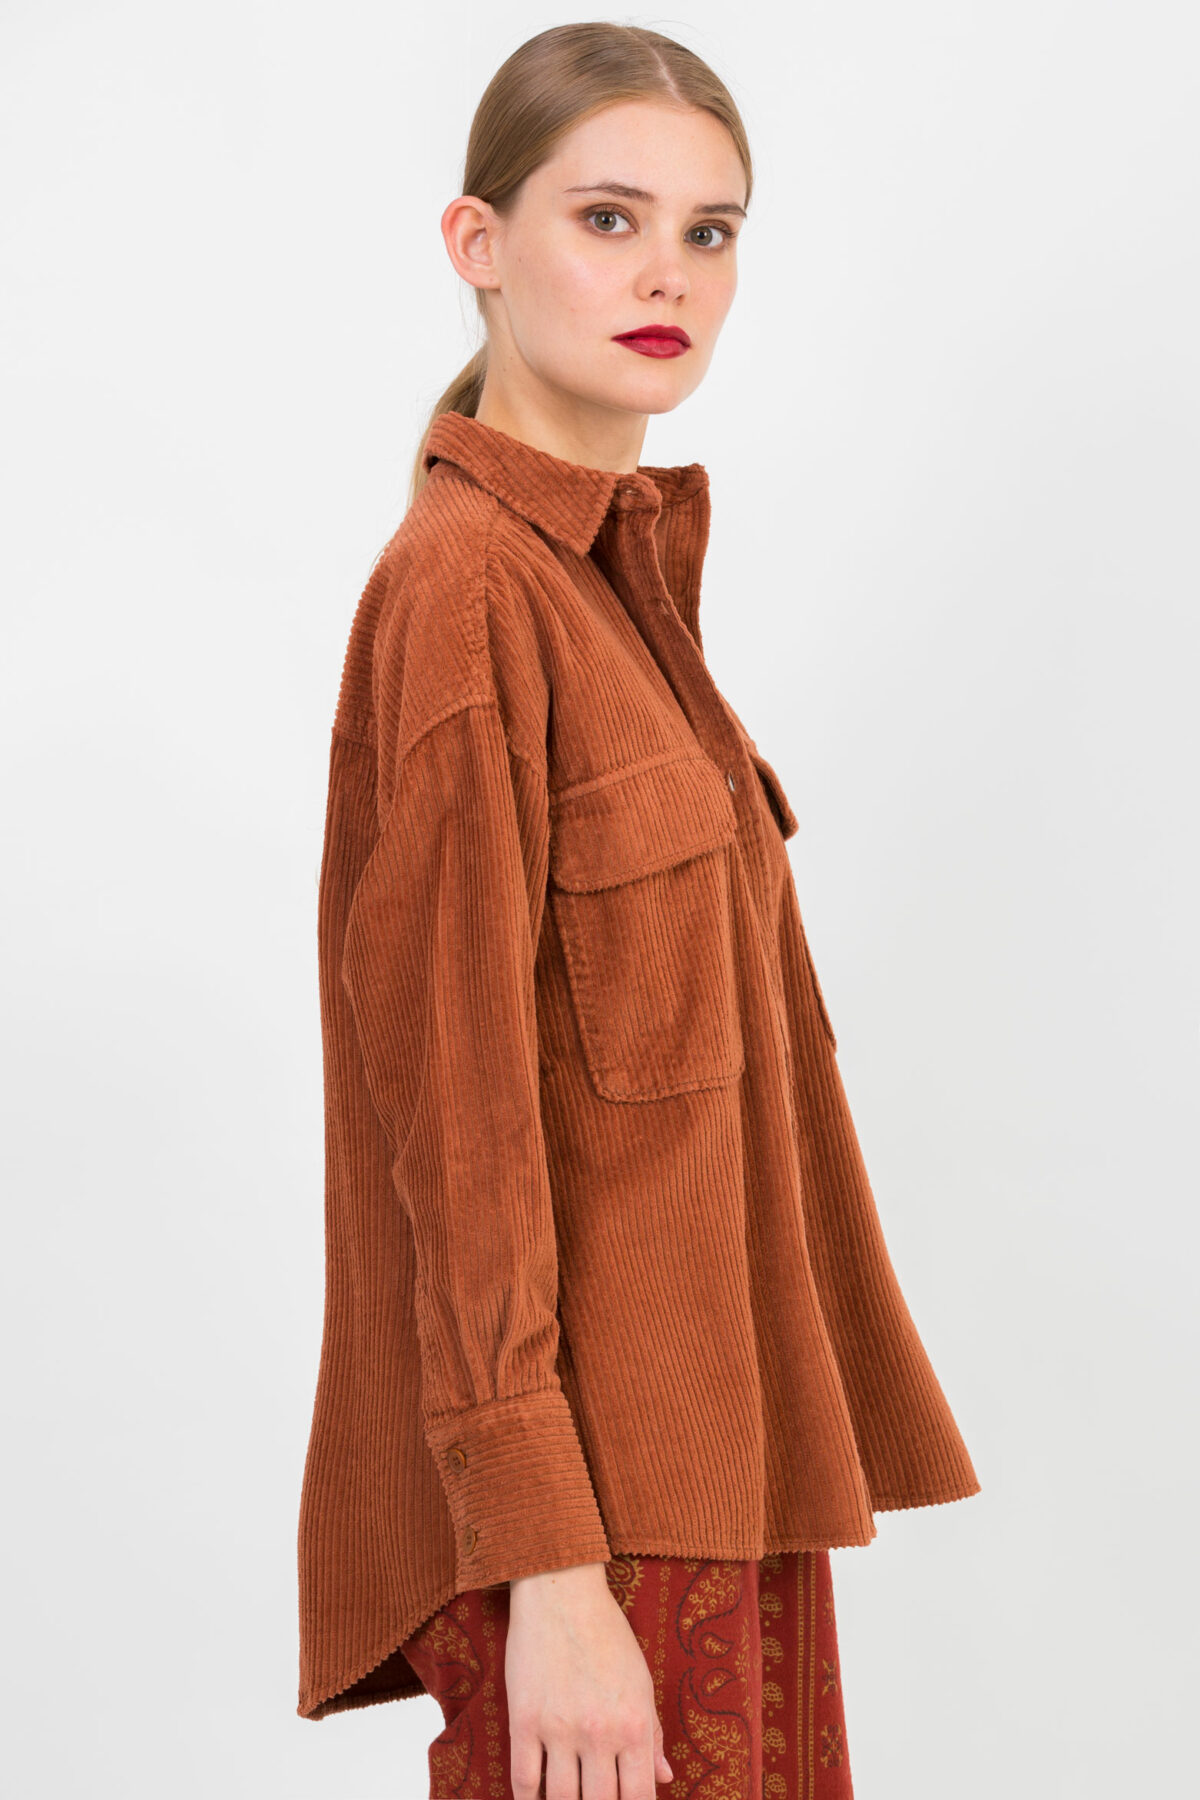 collins-brick-corduroy-overshirt-reiko-matchboxathens